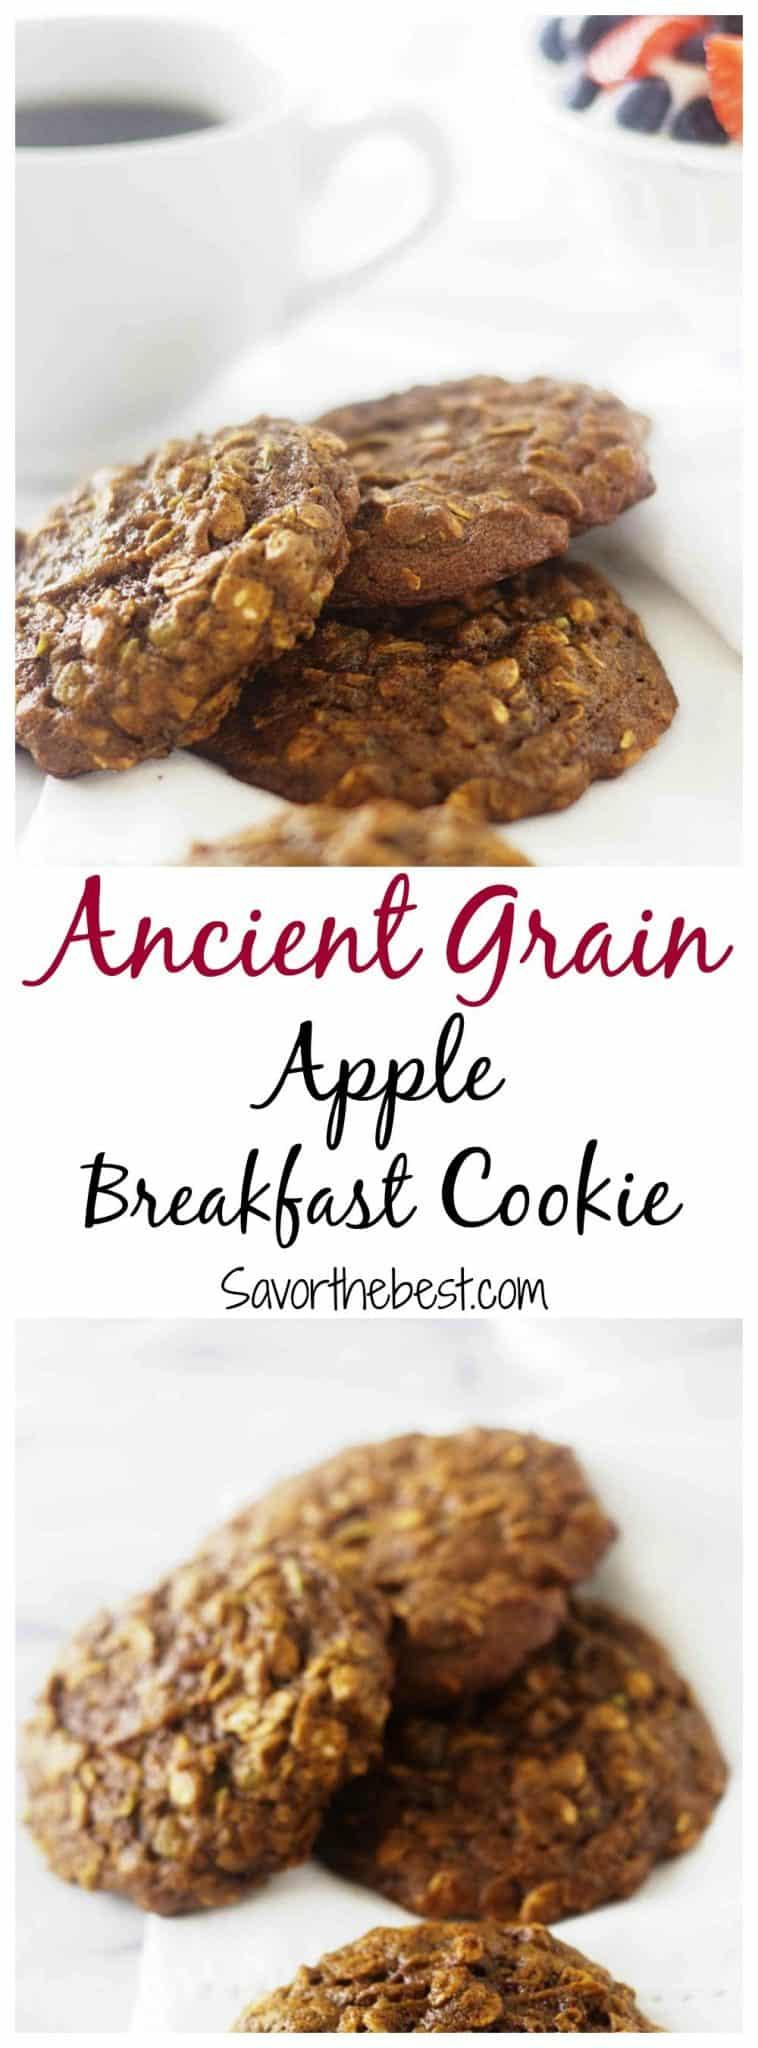 ancient grain apple breakfast cooke